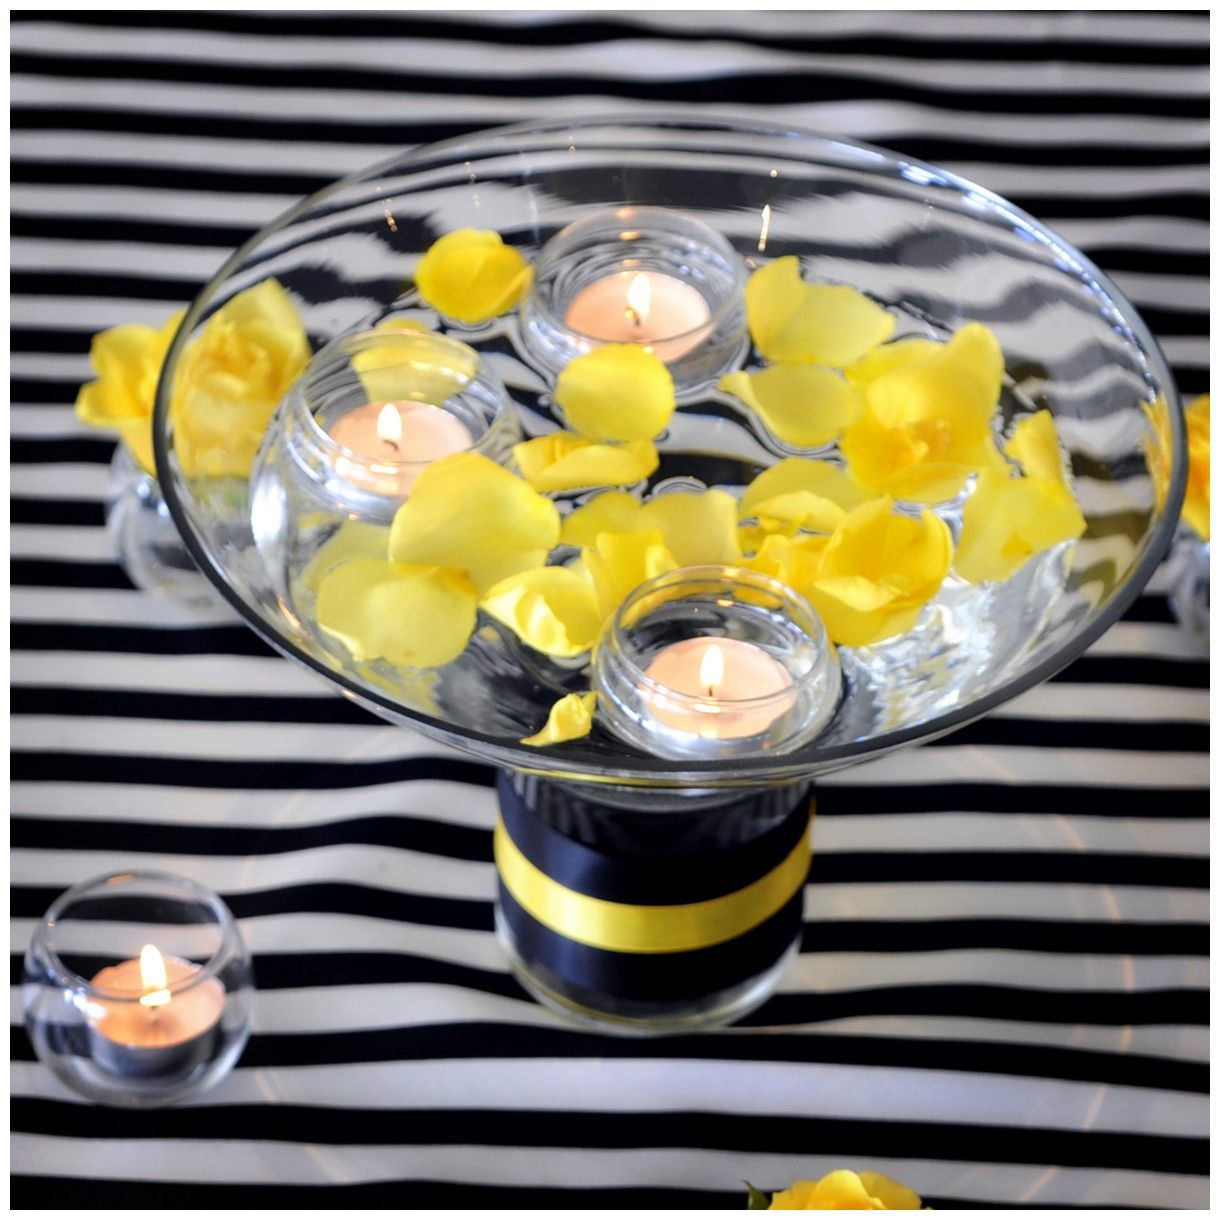 Black and white wedding decor ideas  Yellow and black  More wedding  Pinterest  Wedding Theme